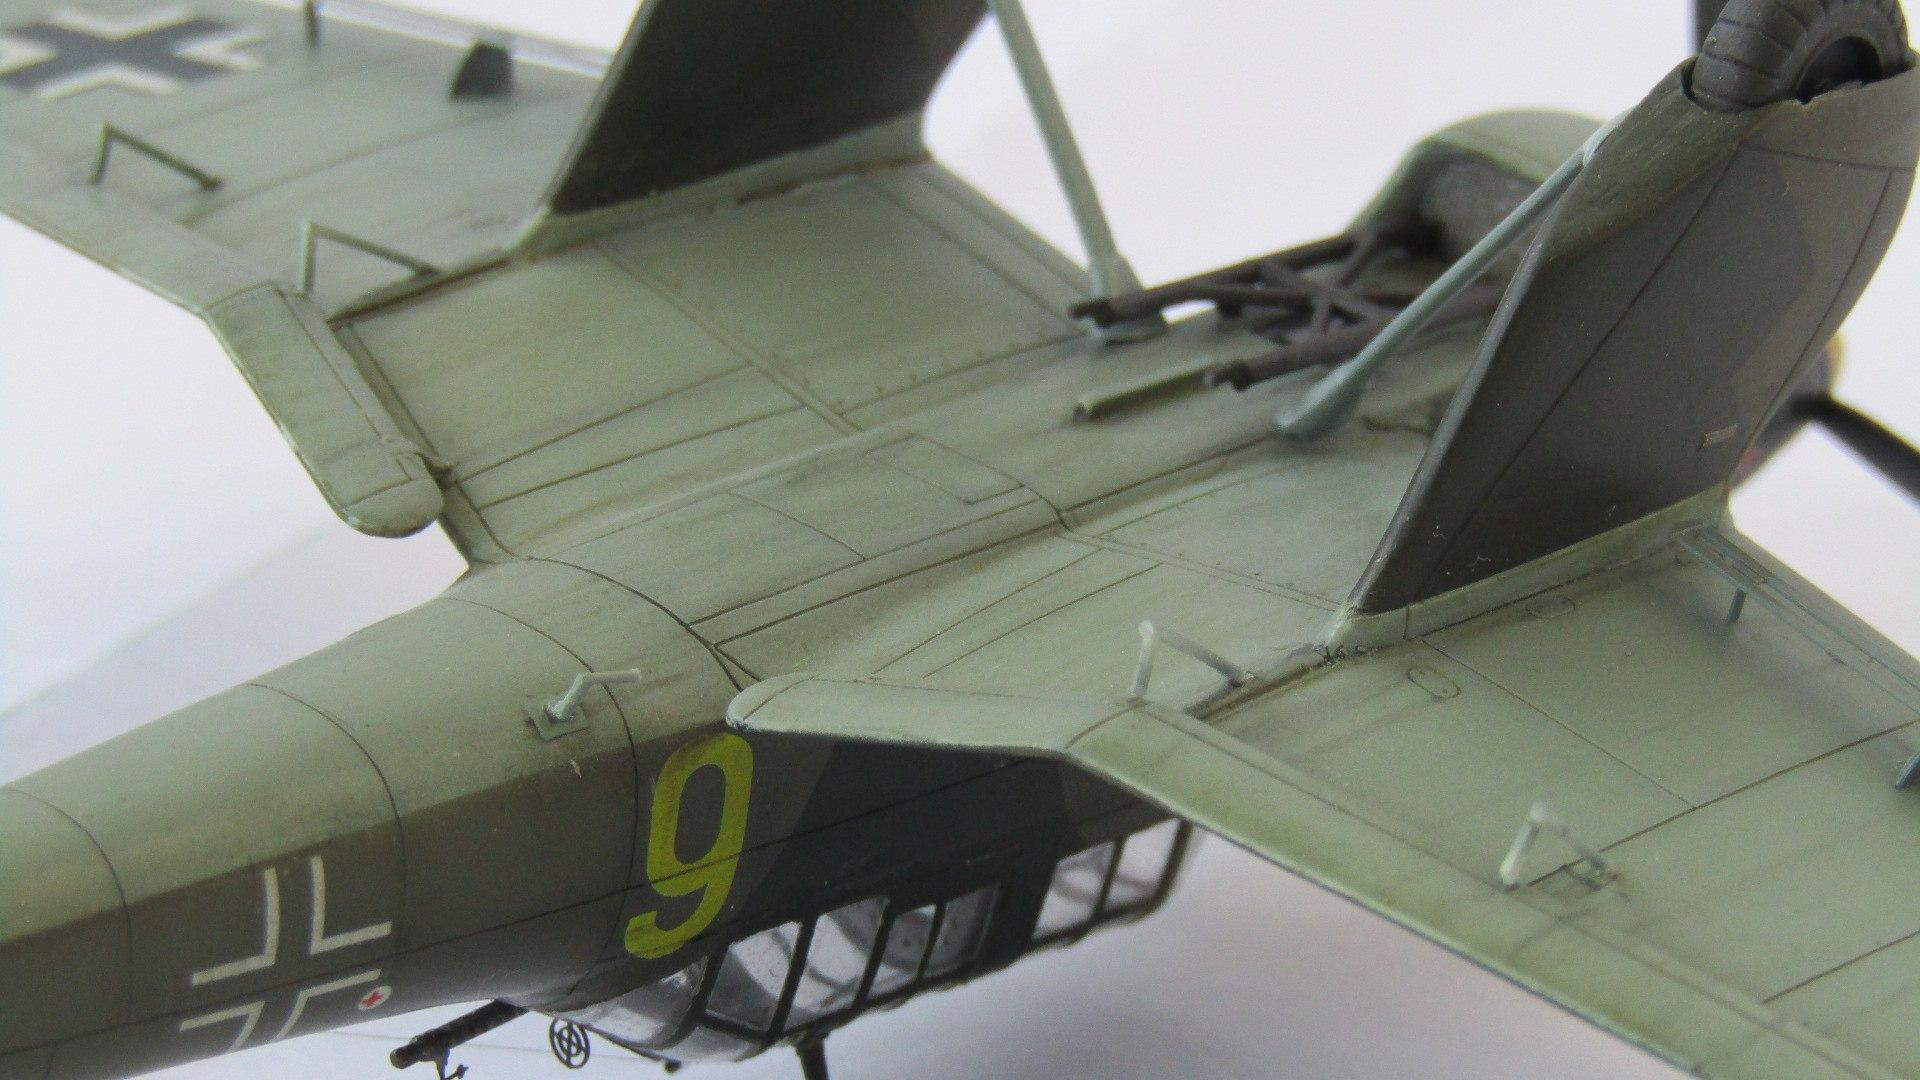 Ju-87A 1/72 (Special Hobby) Zim8kBVPyzQ